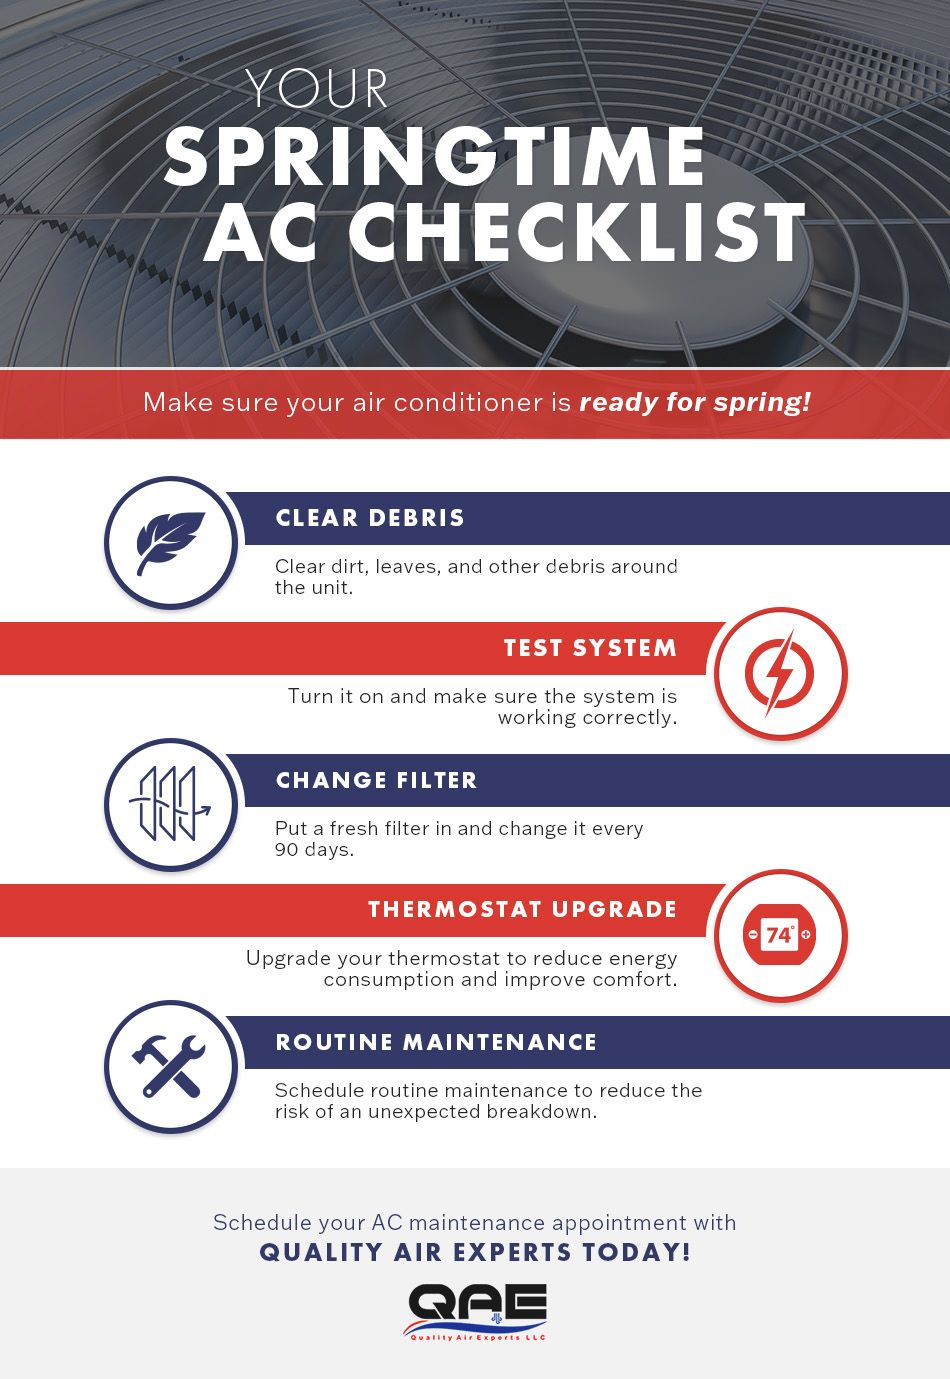 Springtime checklist infographic.jpg